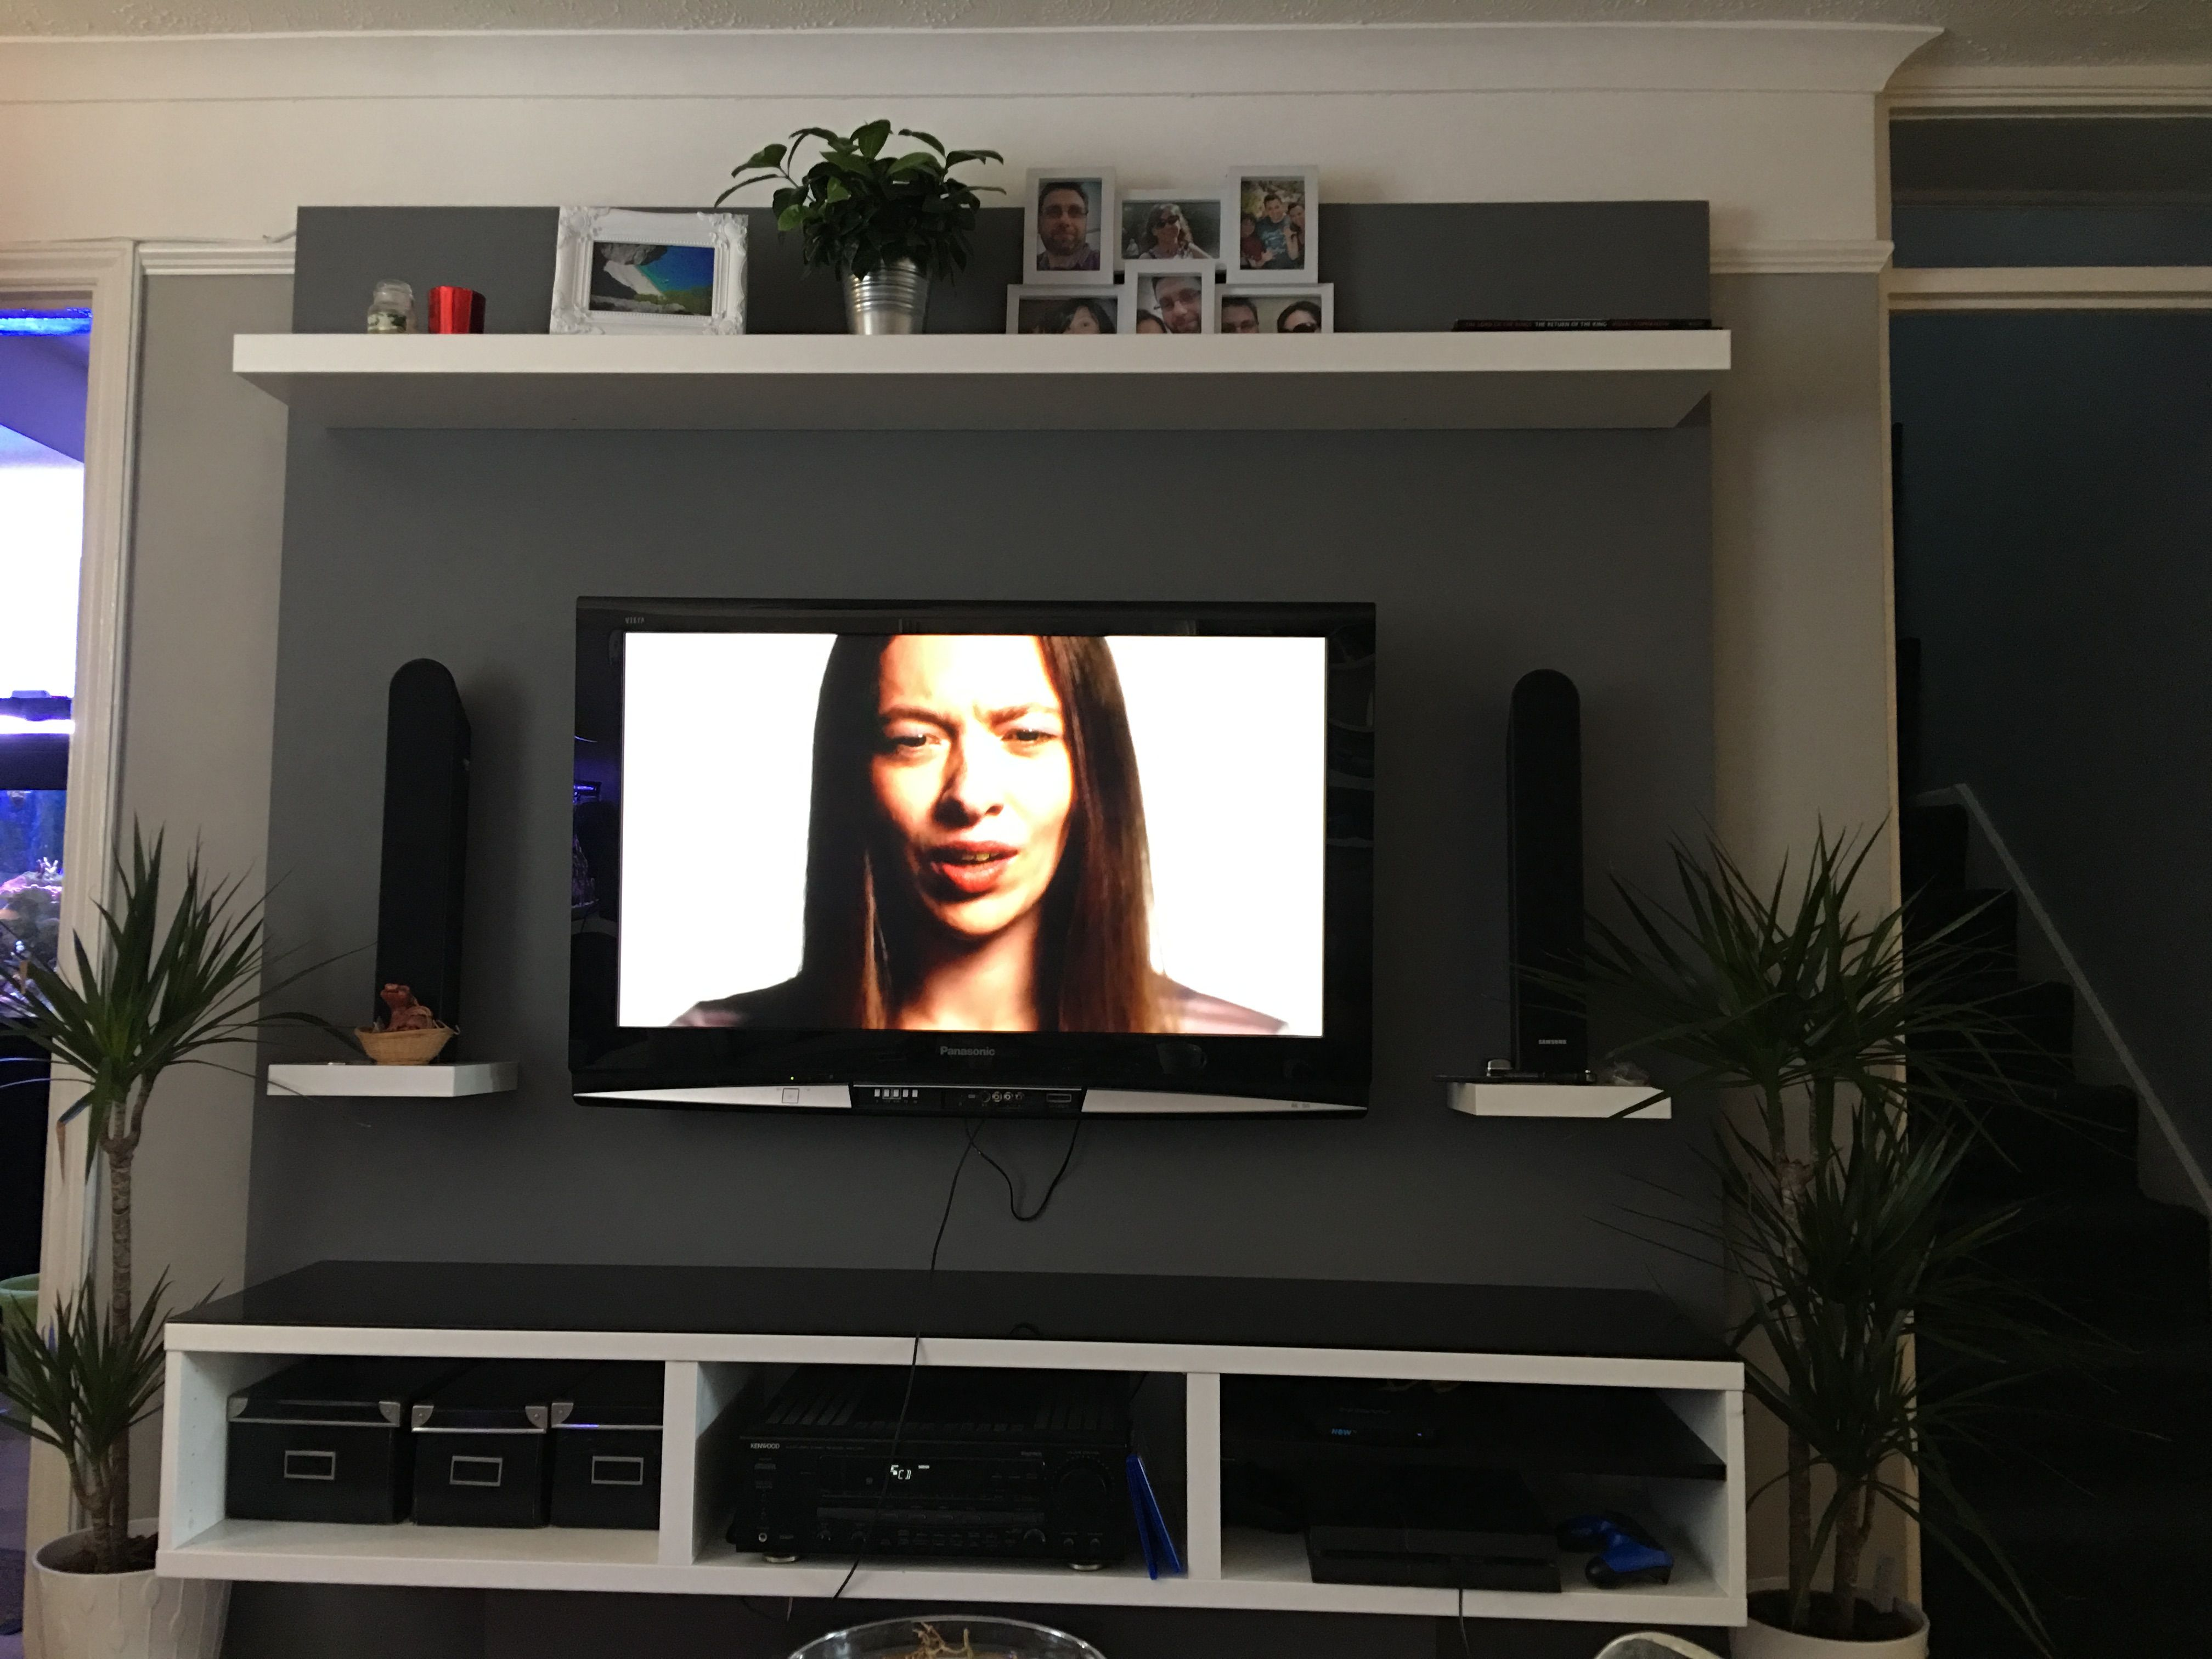 Pin By Barry John On False Wall With TV Mount Pinterest False - Tv false wall